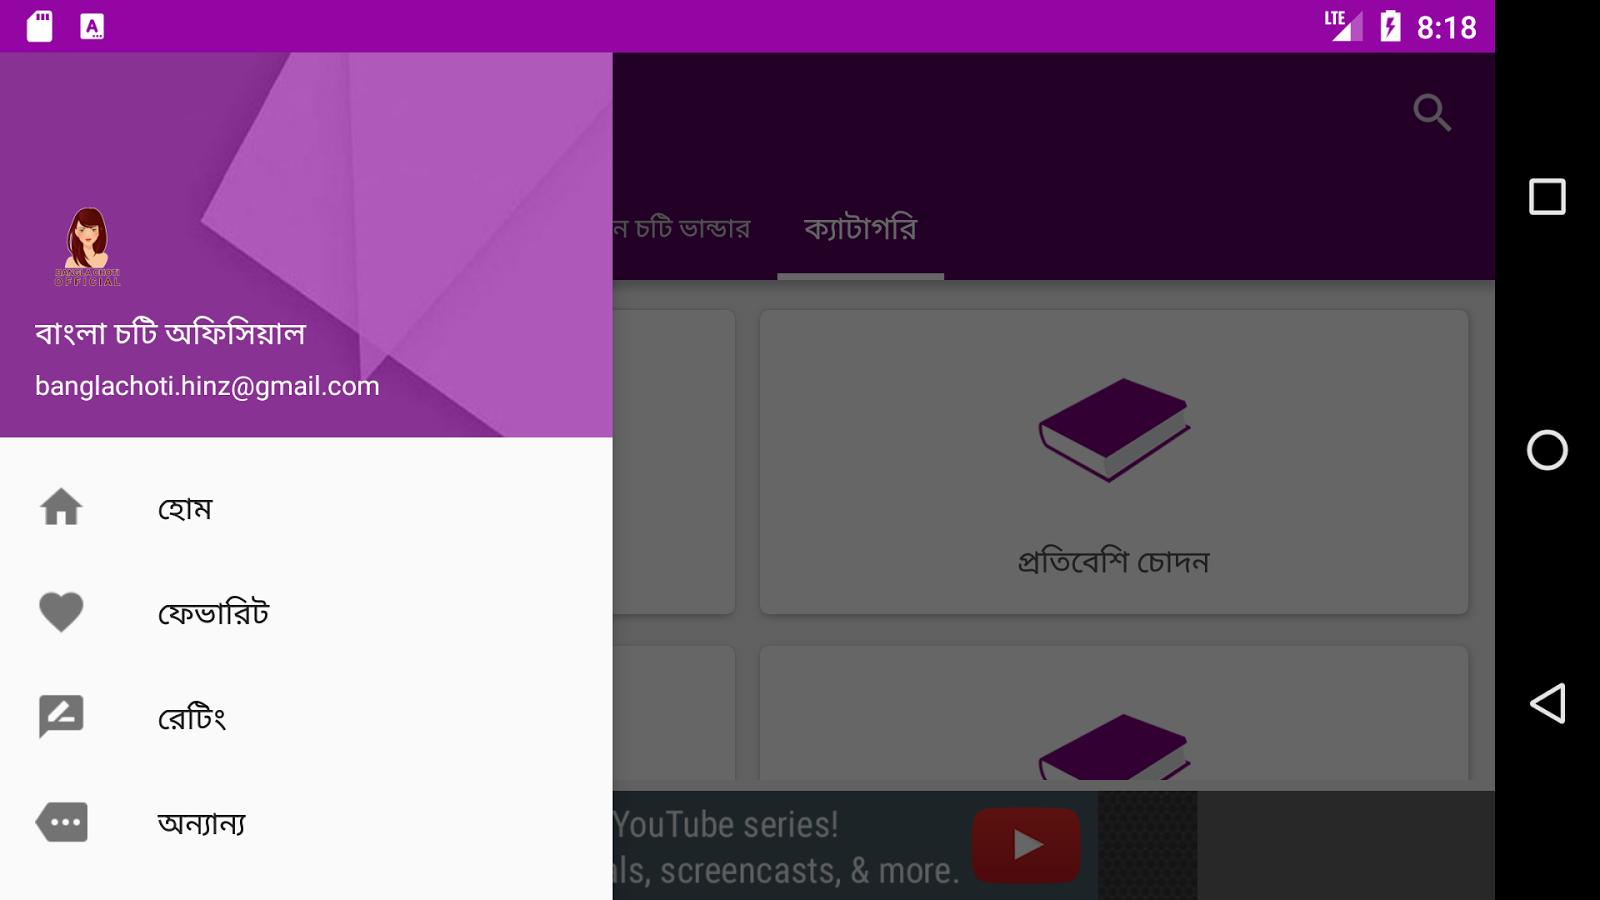 Bangla Choti bangla choti official 1.5.0 apk download - android